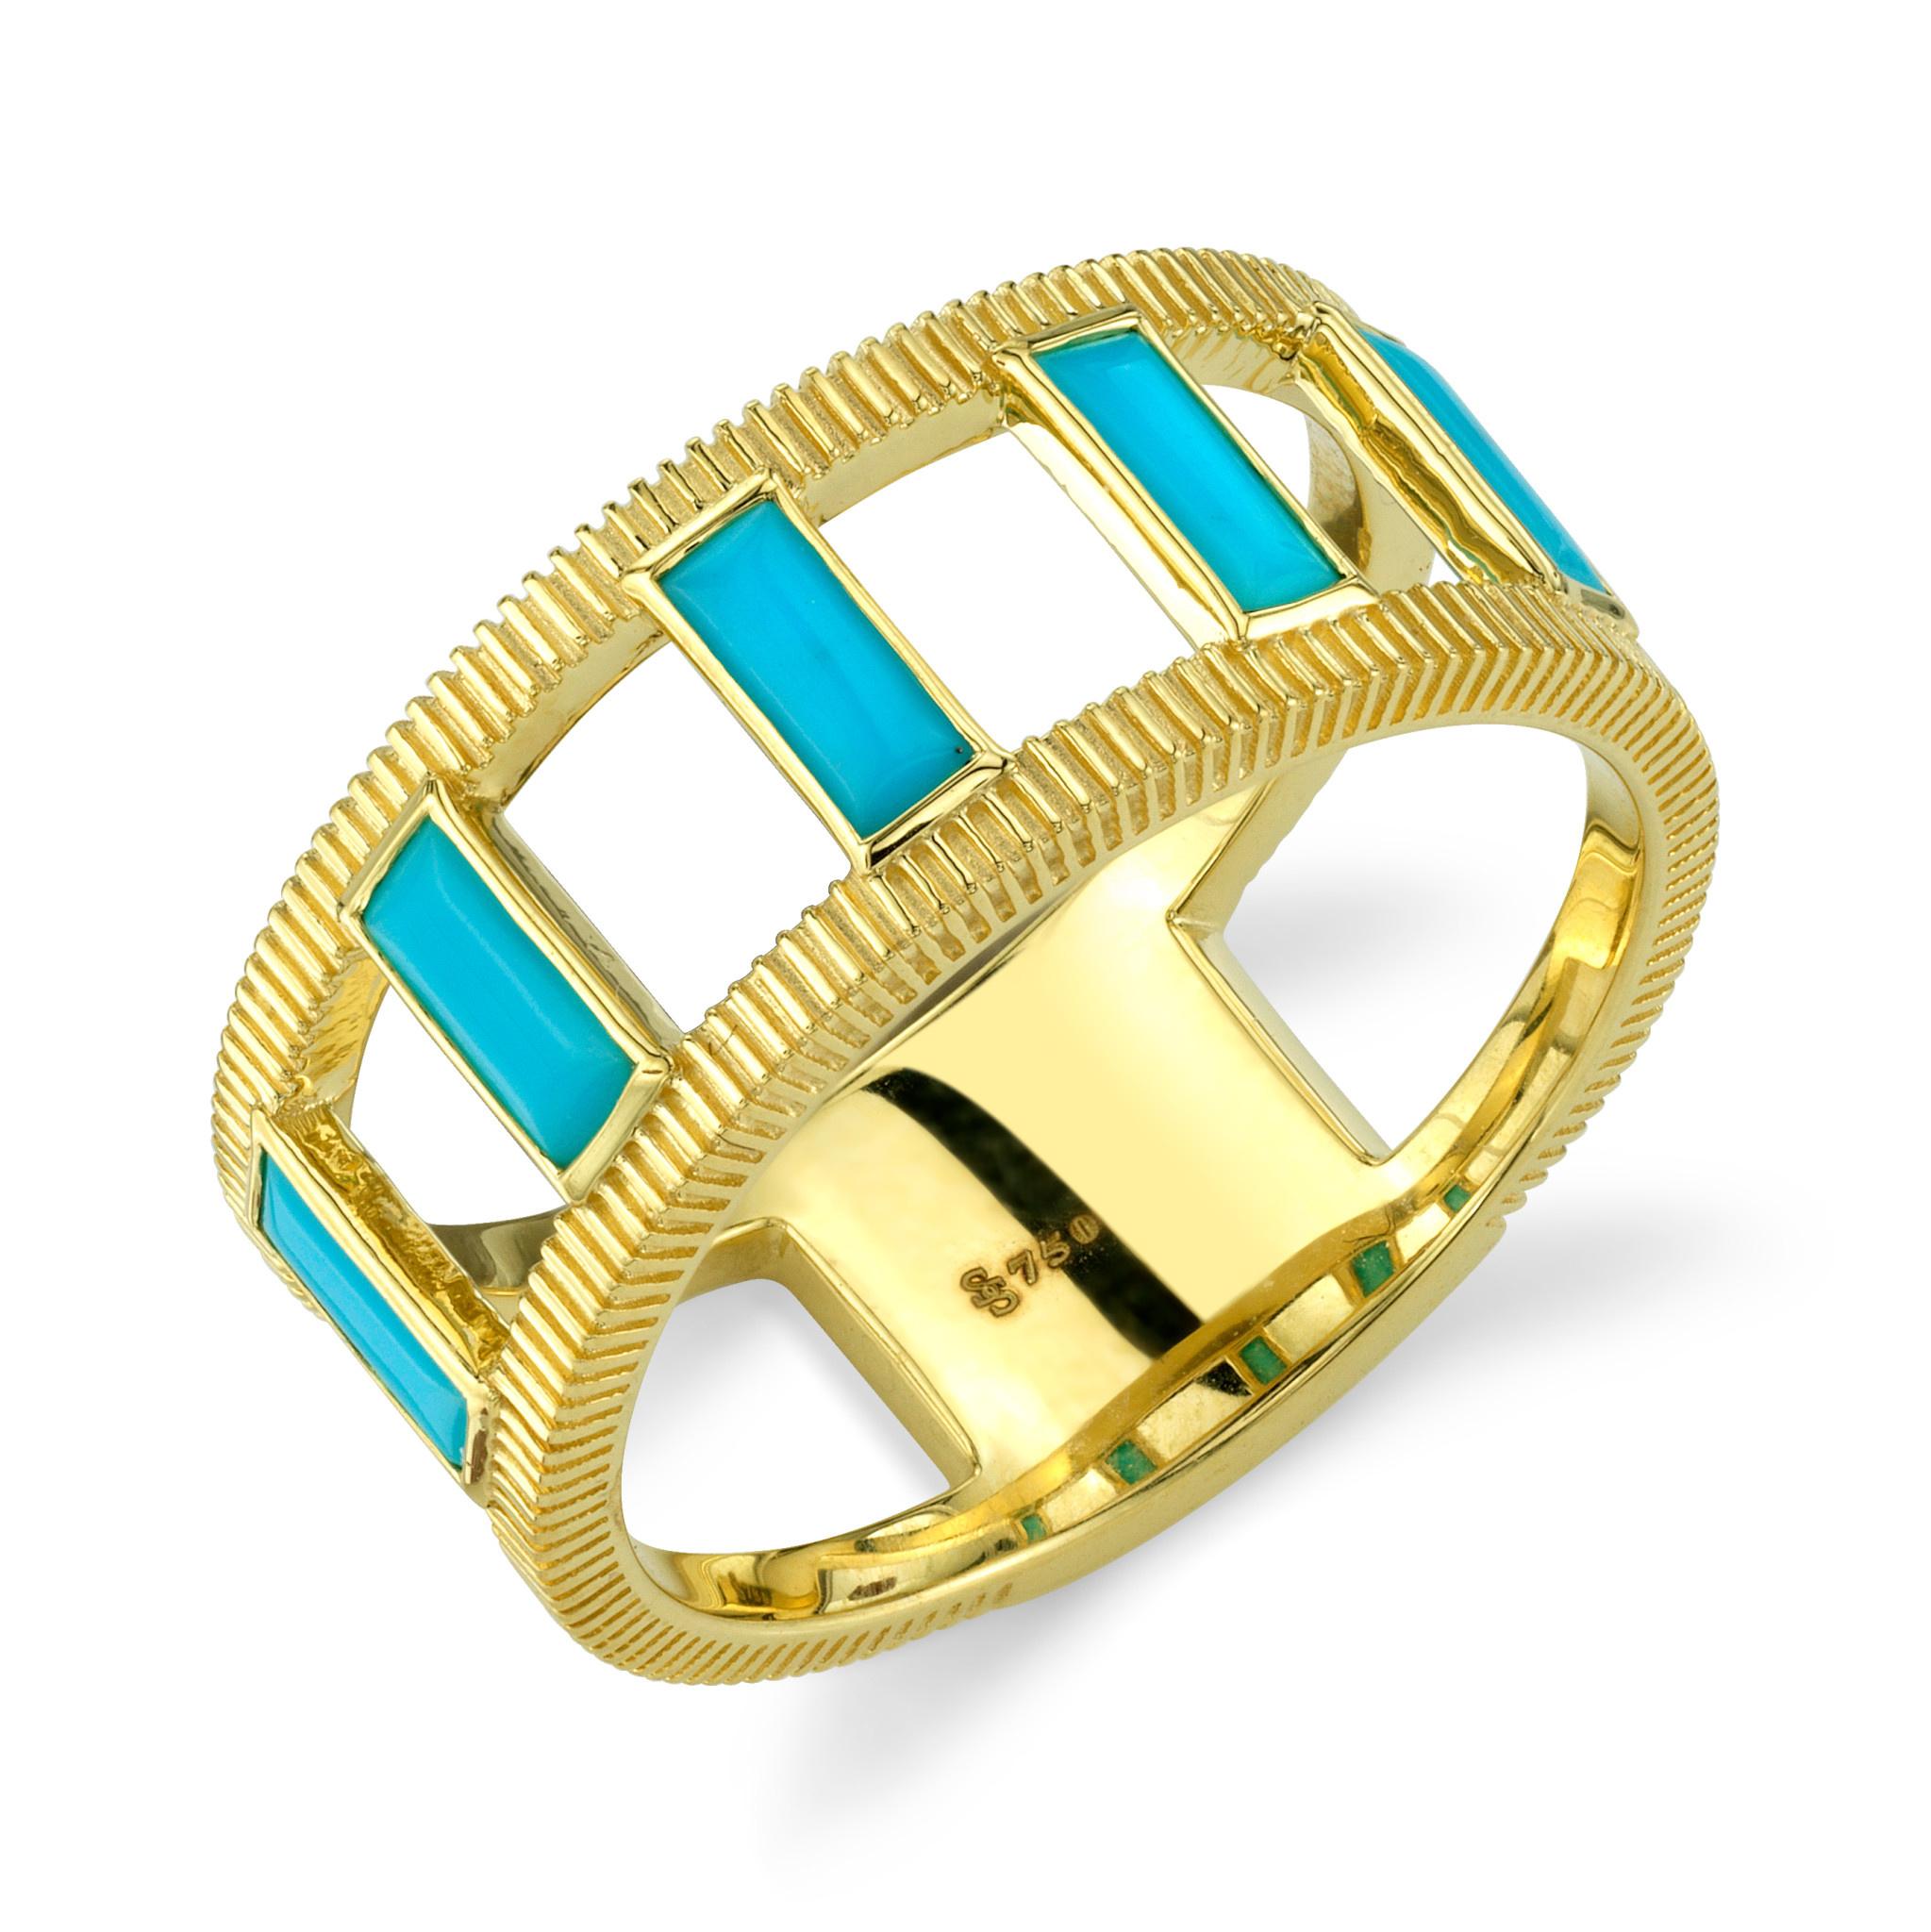 Emerald Cut Turq Ring